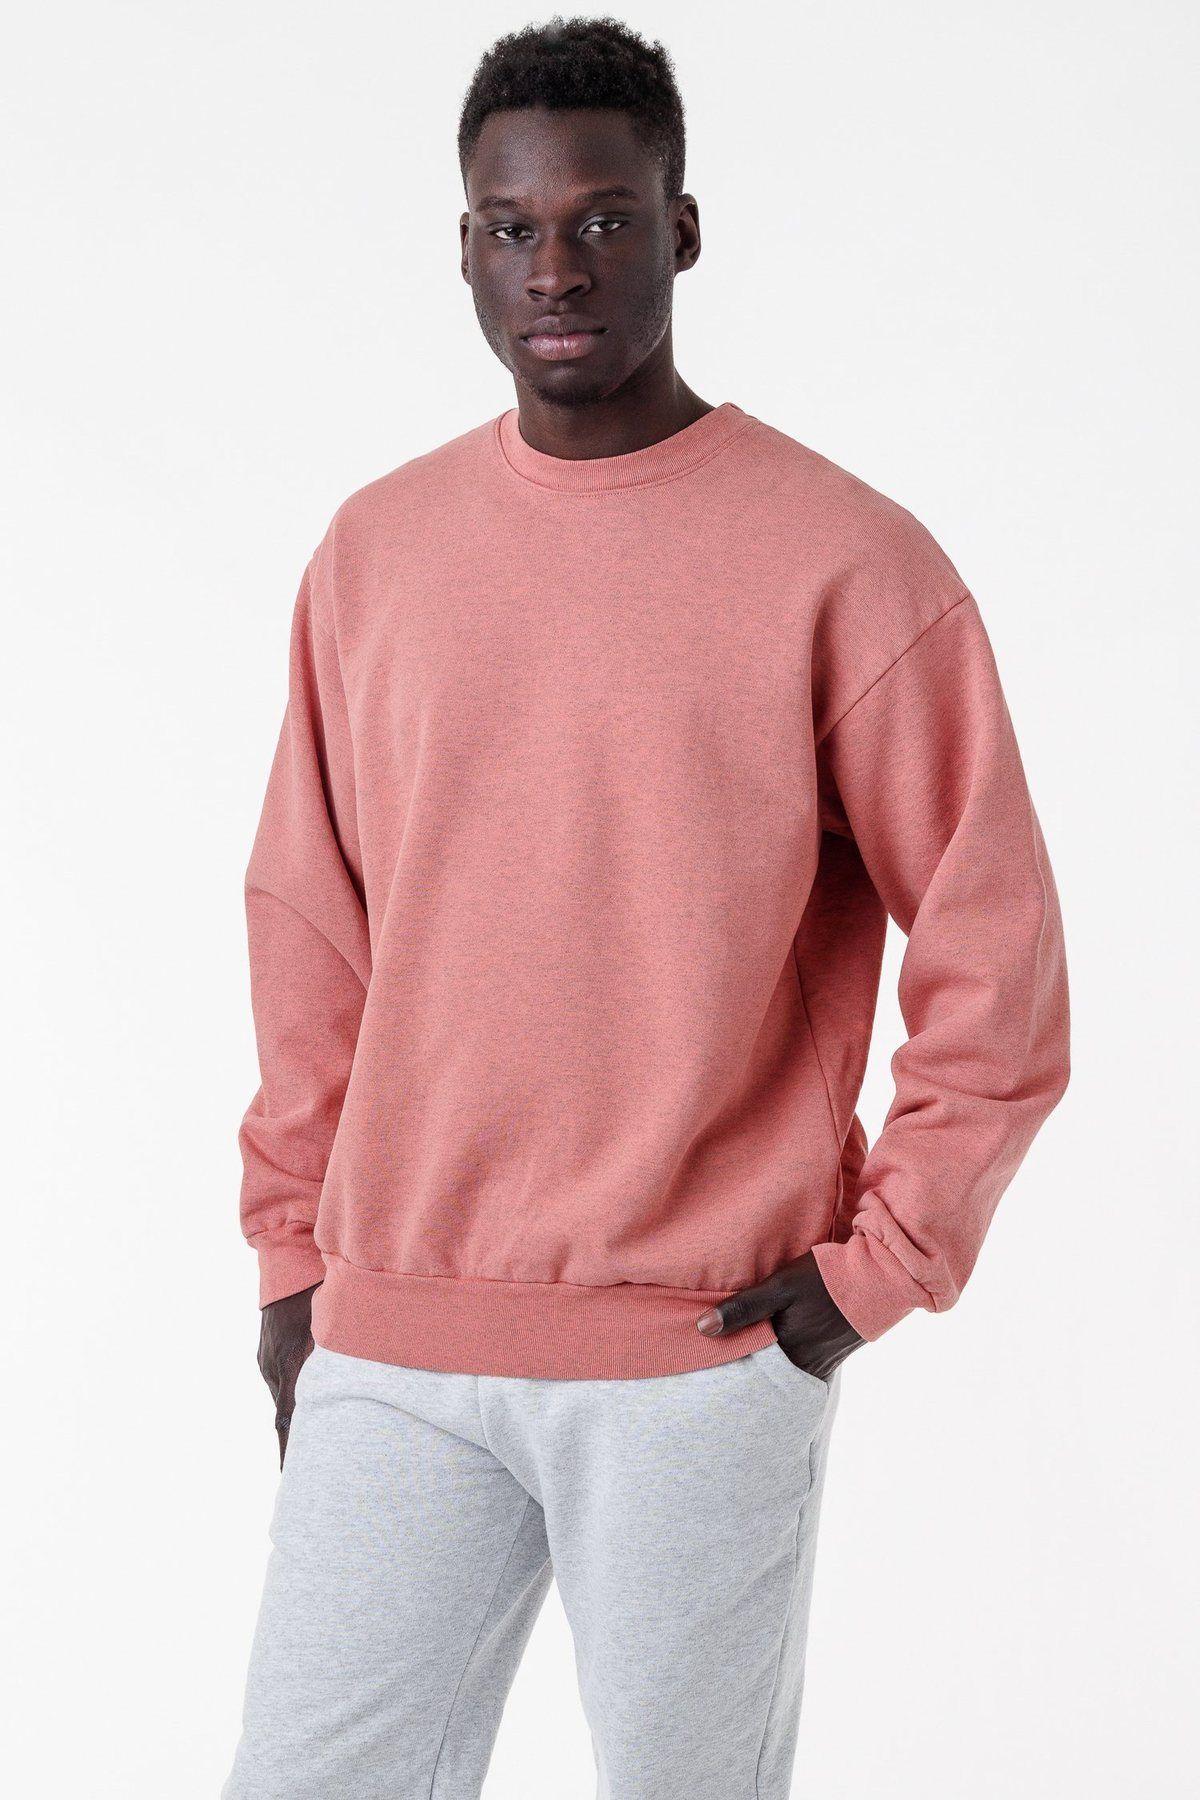 Hf07gd 14oz Garment Dye Heavy Fleece Pullover Crewneck Sweatshirt Crew Neck Sweatshirt Fleece Pullover Garment Dye [ 1800 x 1200 Pixel ]